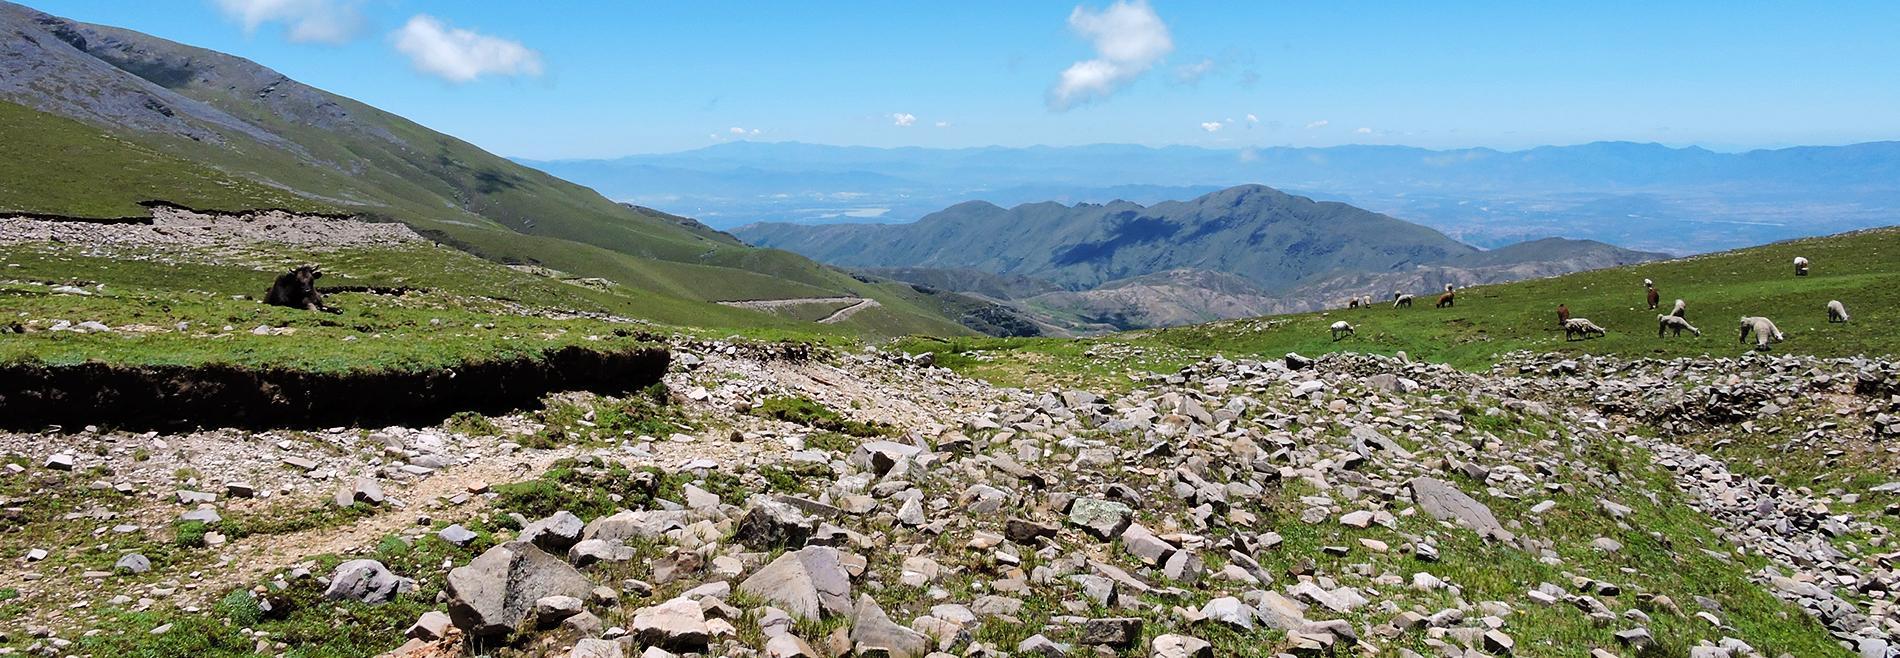 El falso Camino del Inca de Tarija